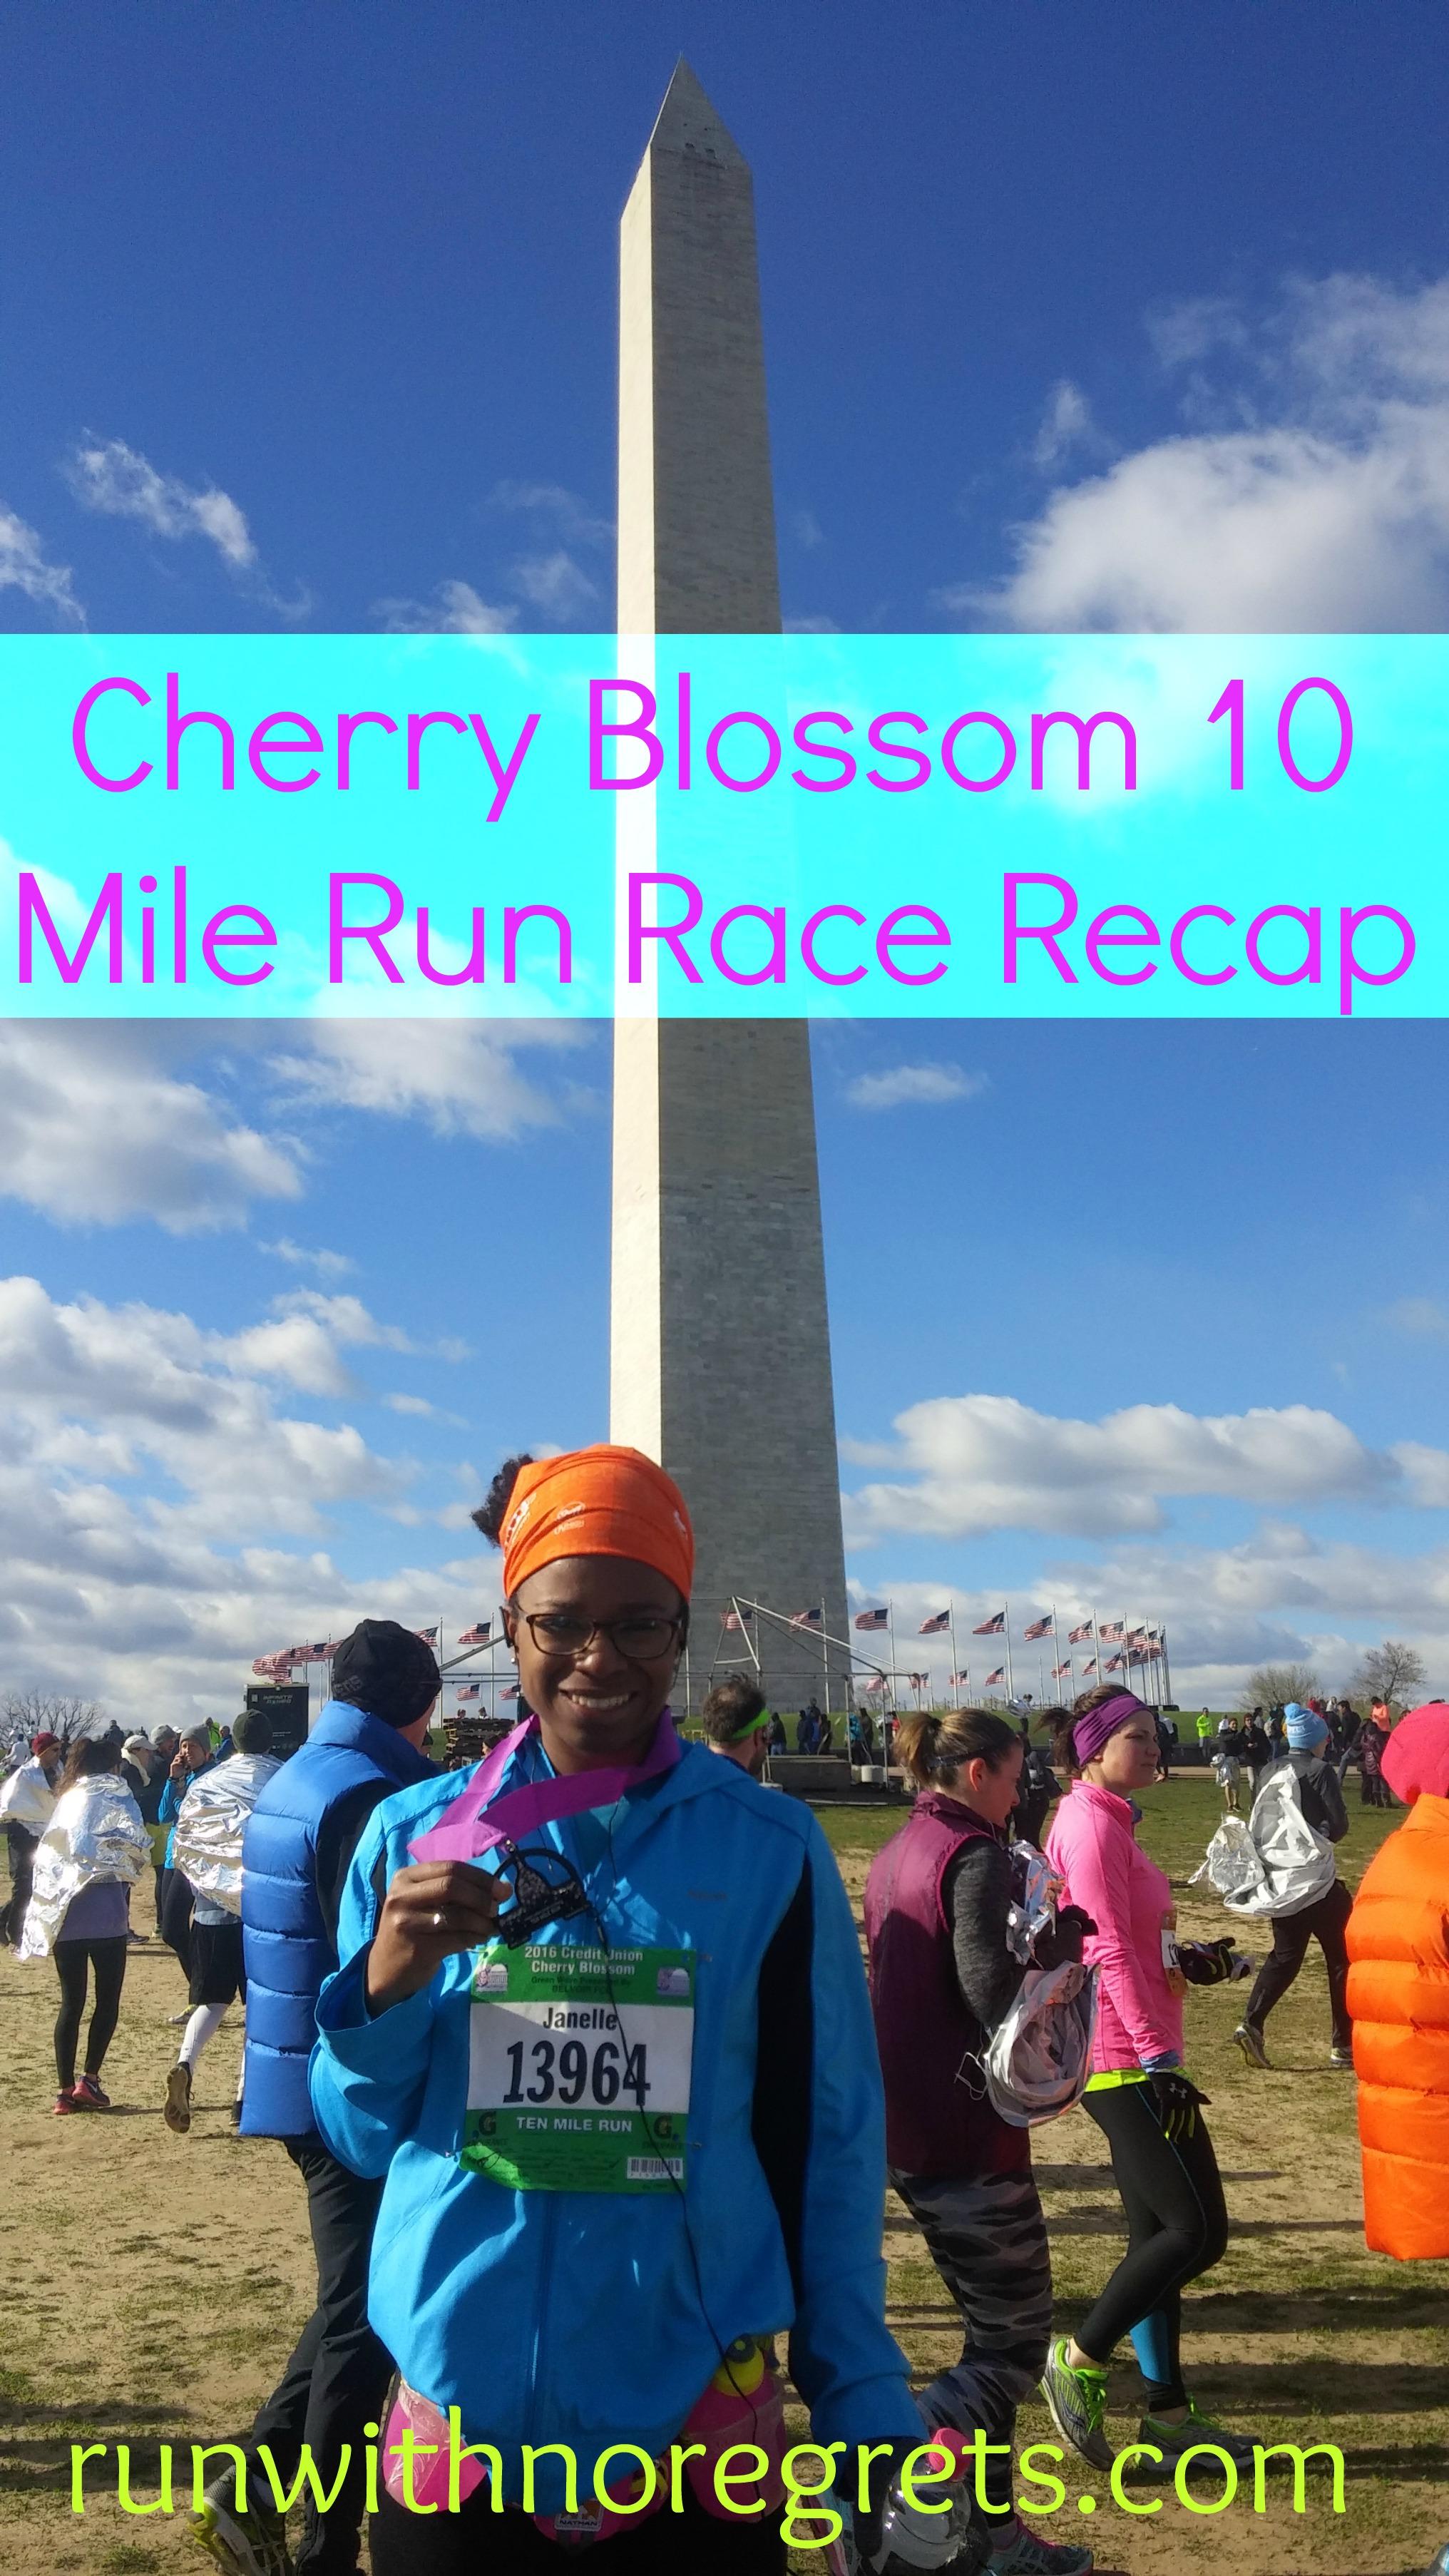 2016 Cherry Blossom 10 Miler Race Recap | Run With No Regrets